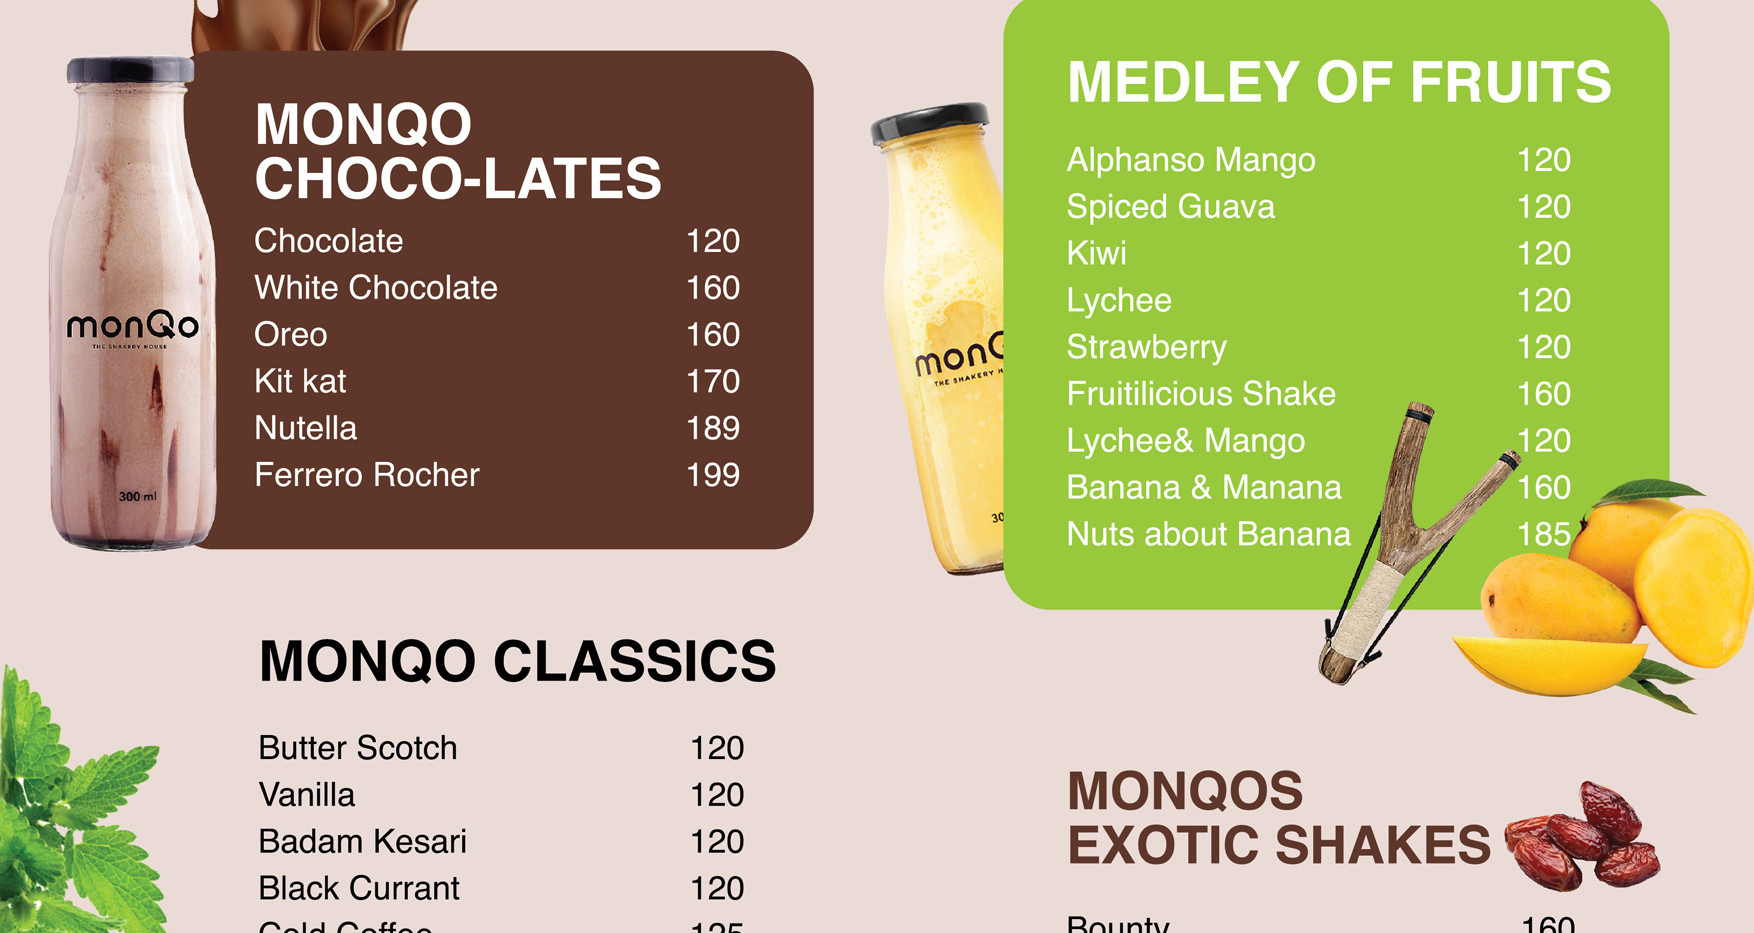 monQo milkshake menu